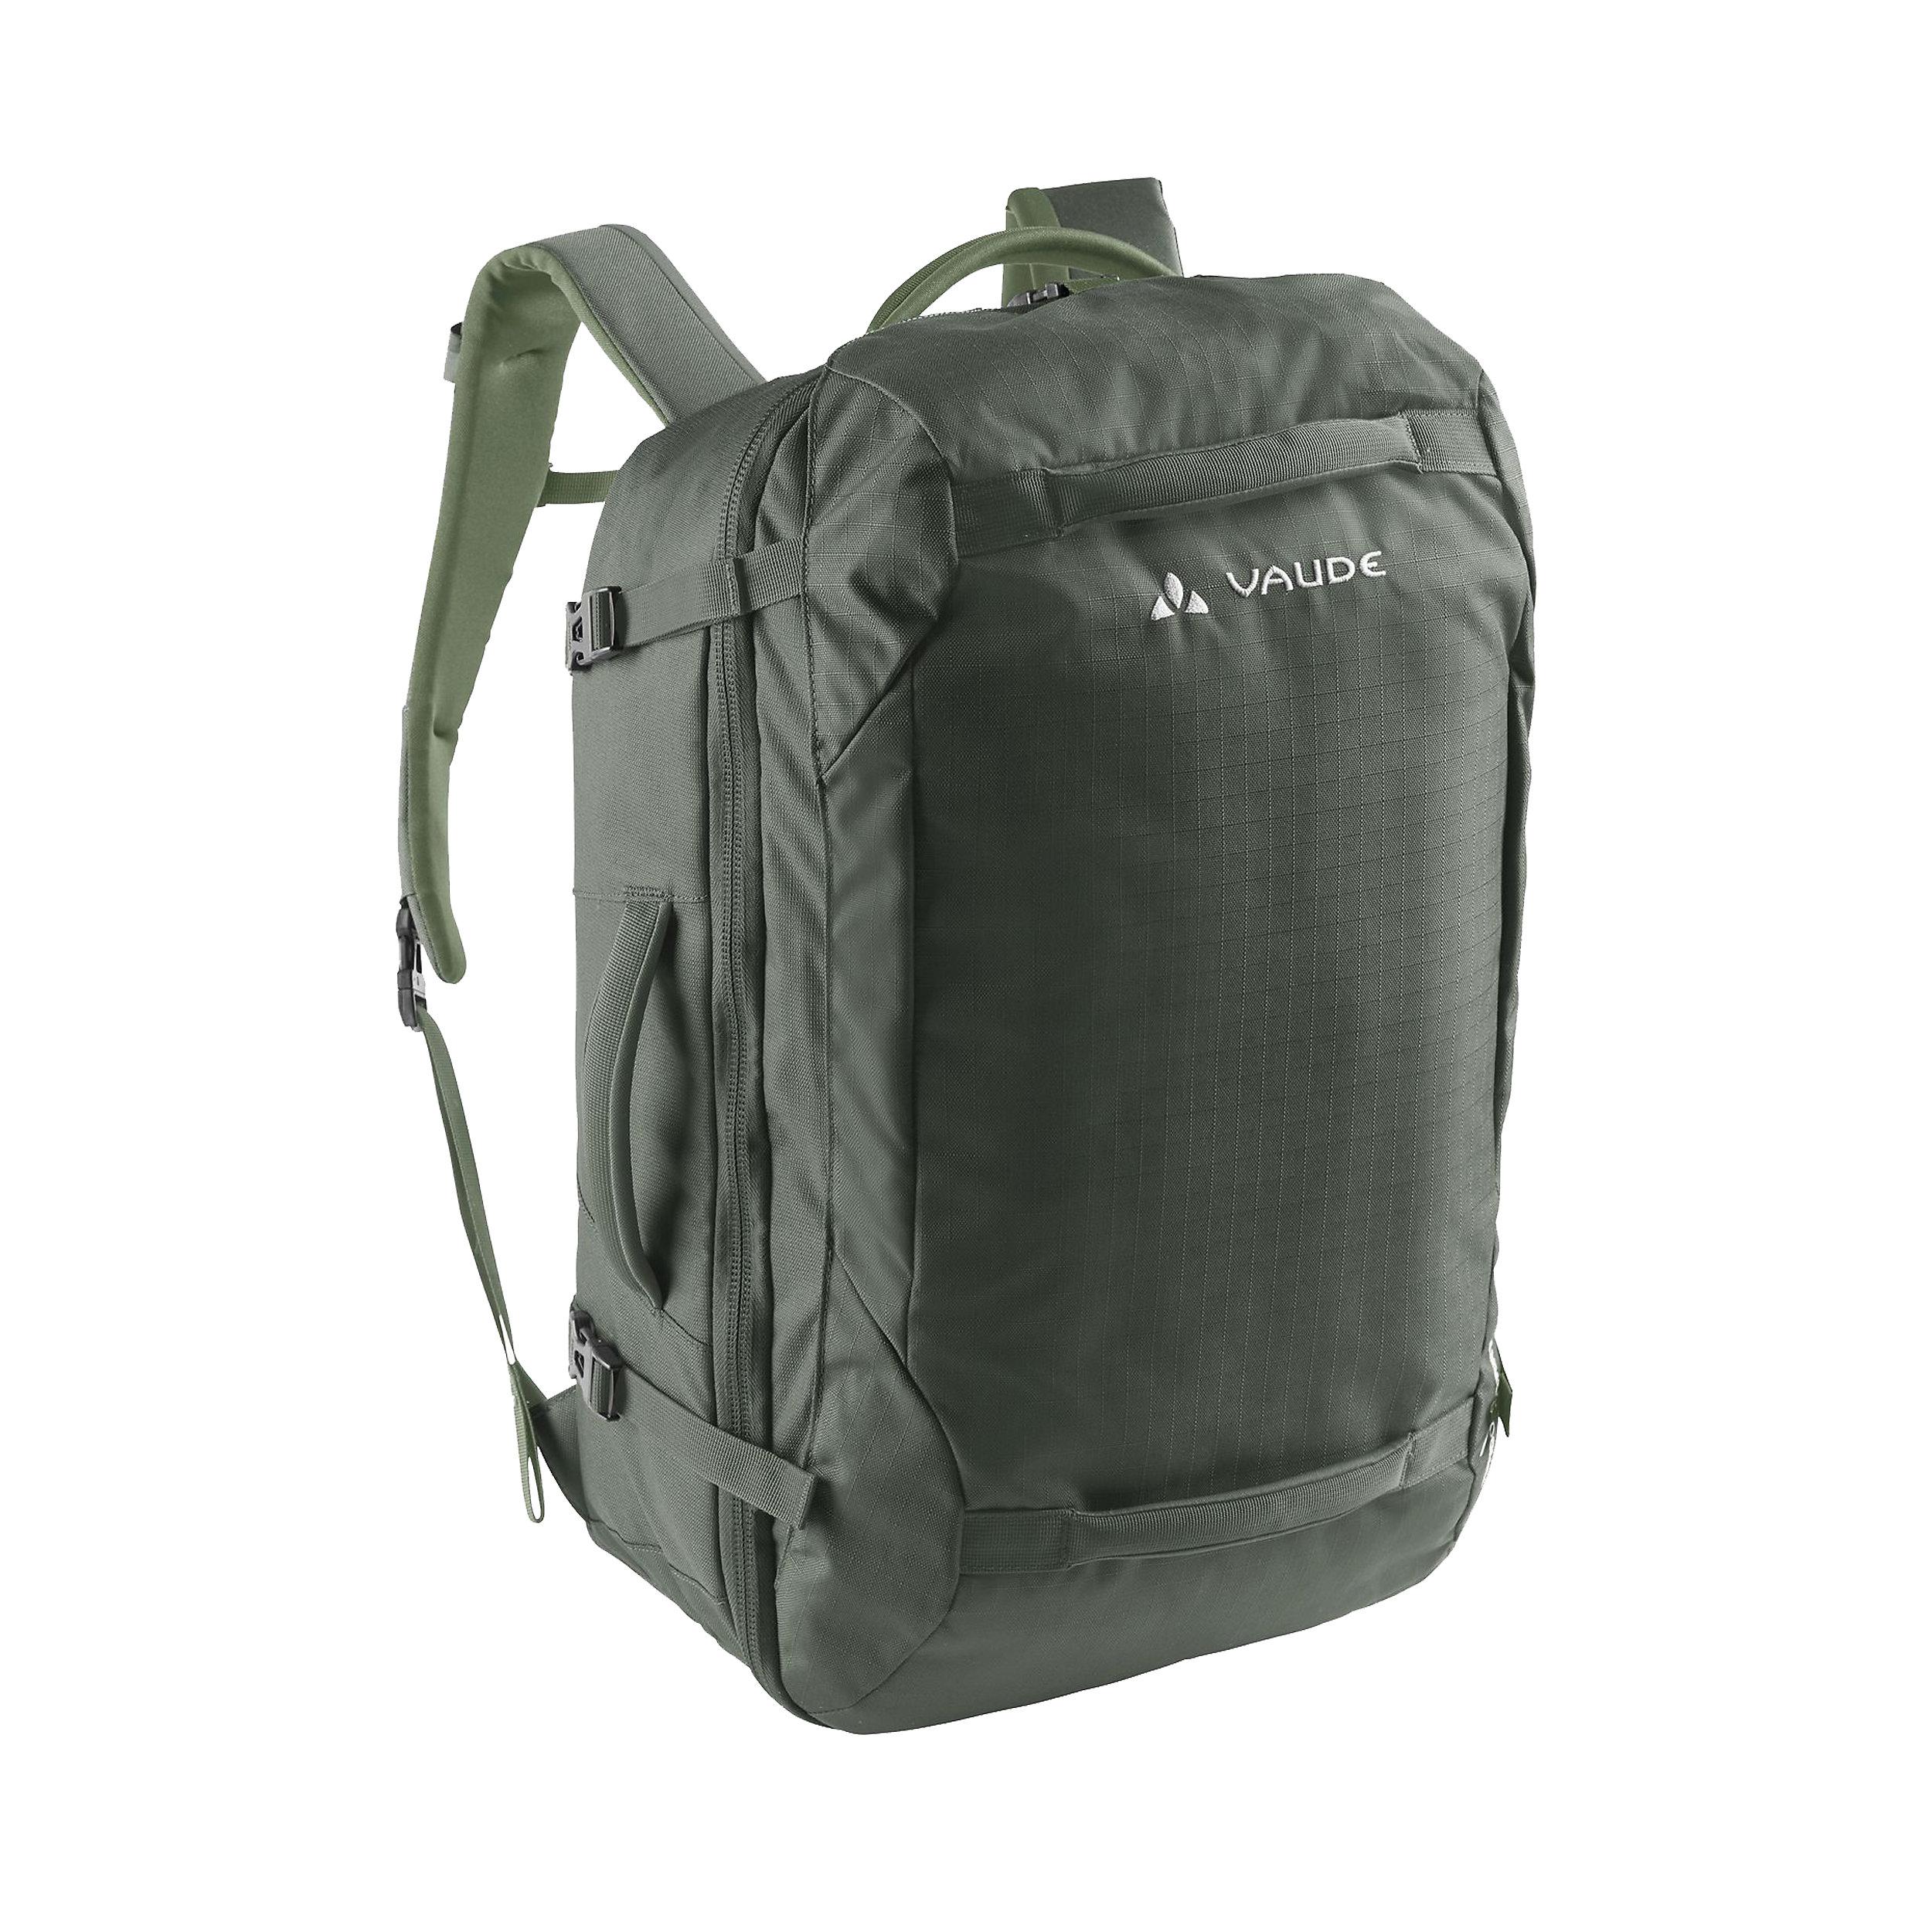 Backpack 15,6 inch Mundo 38 Liter